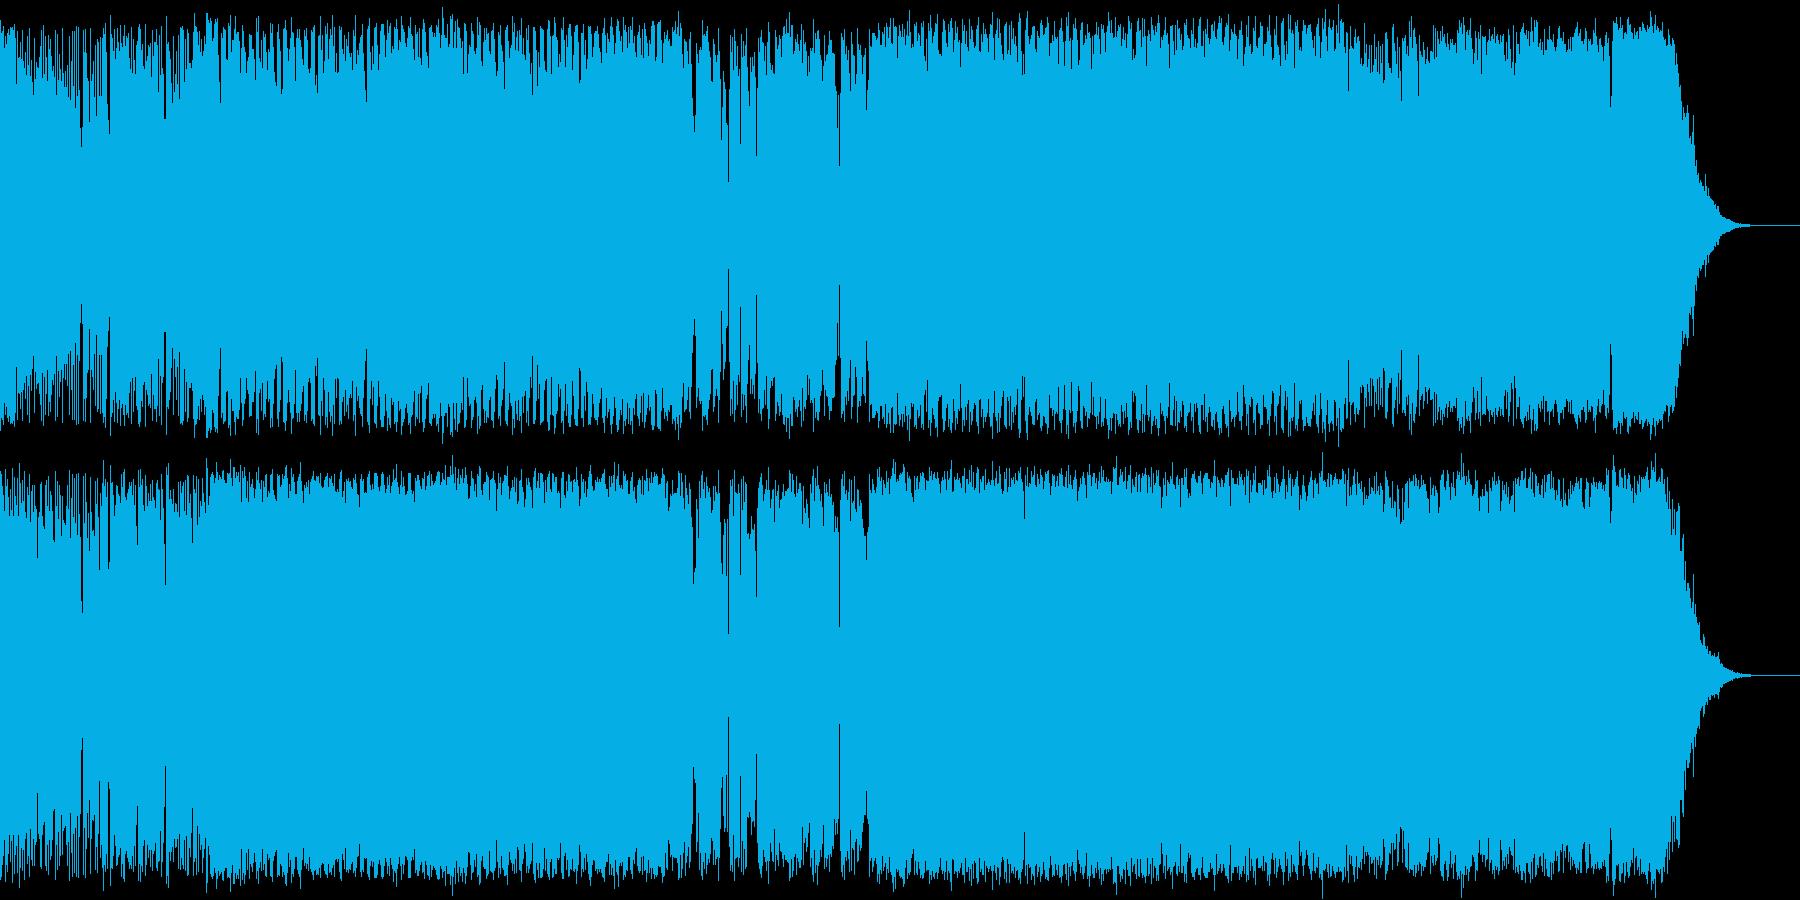 SFとかシューティングの勇猛なイメージBの再生済みの波形